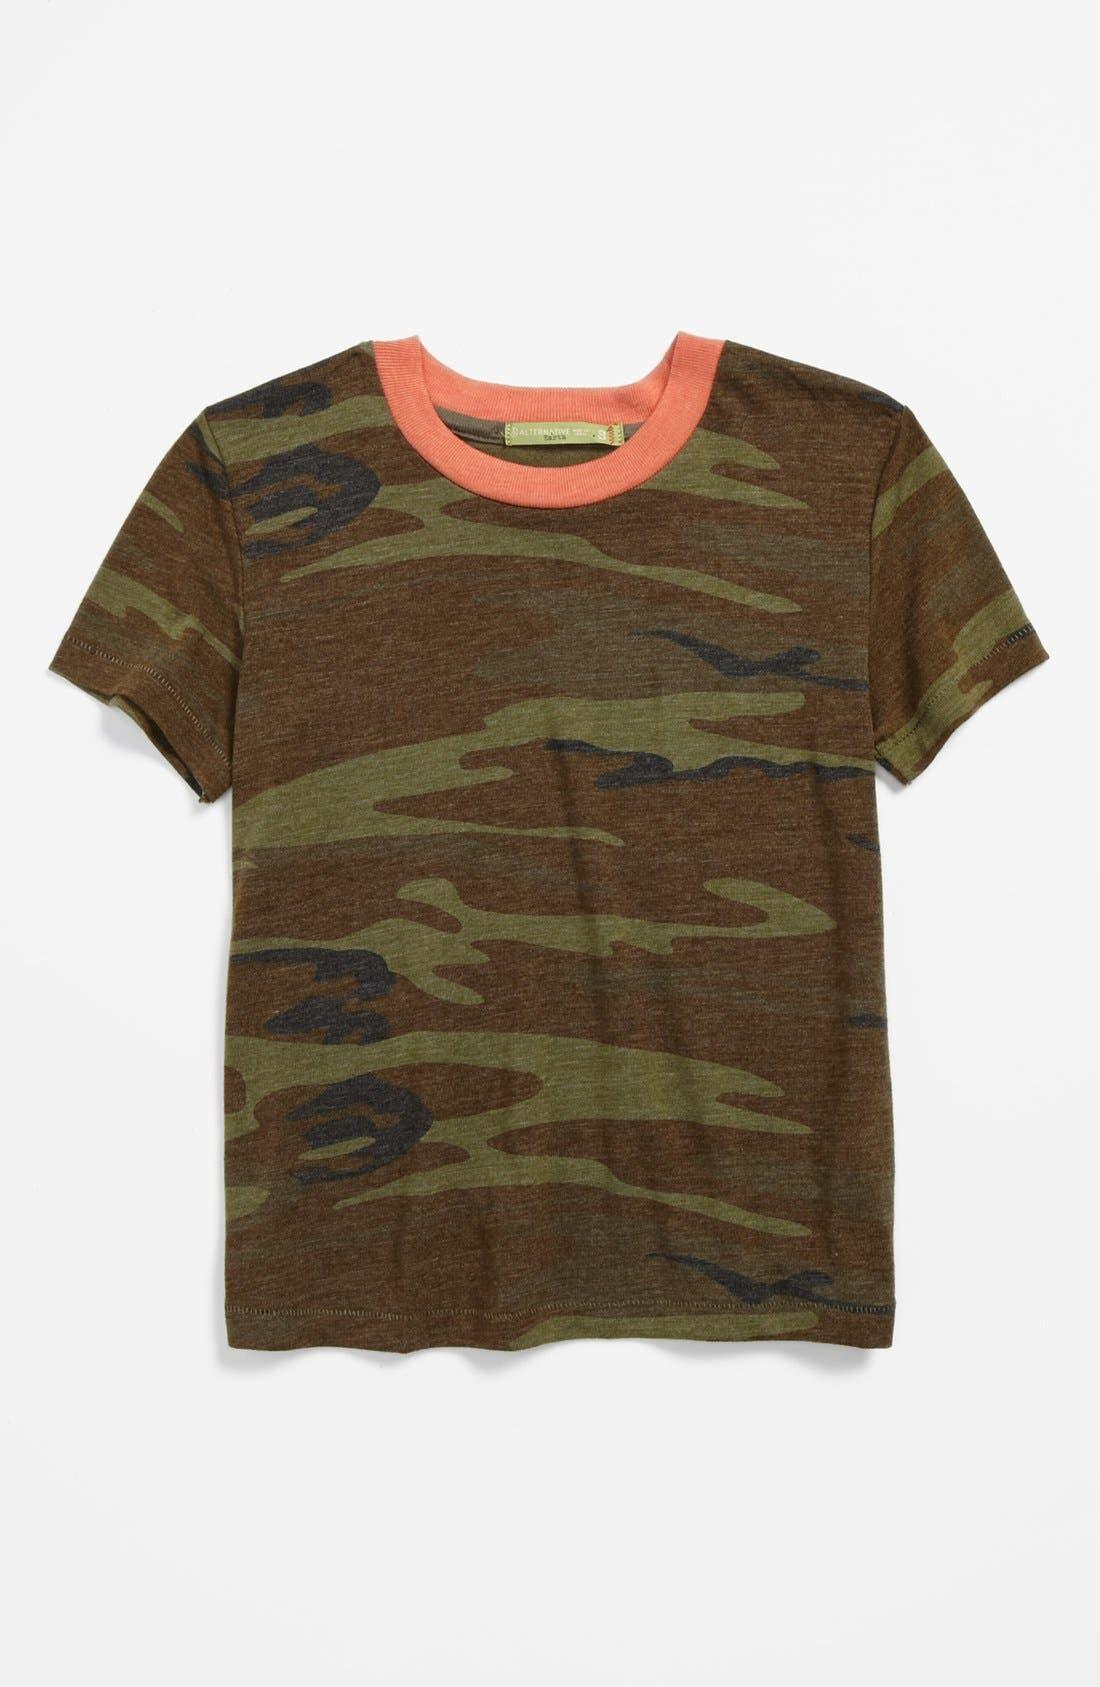 Alternate Image 1 Selected - Alternative Camo T-Shirt (Little Boys & Big Boys)